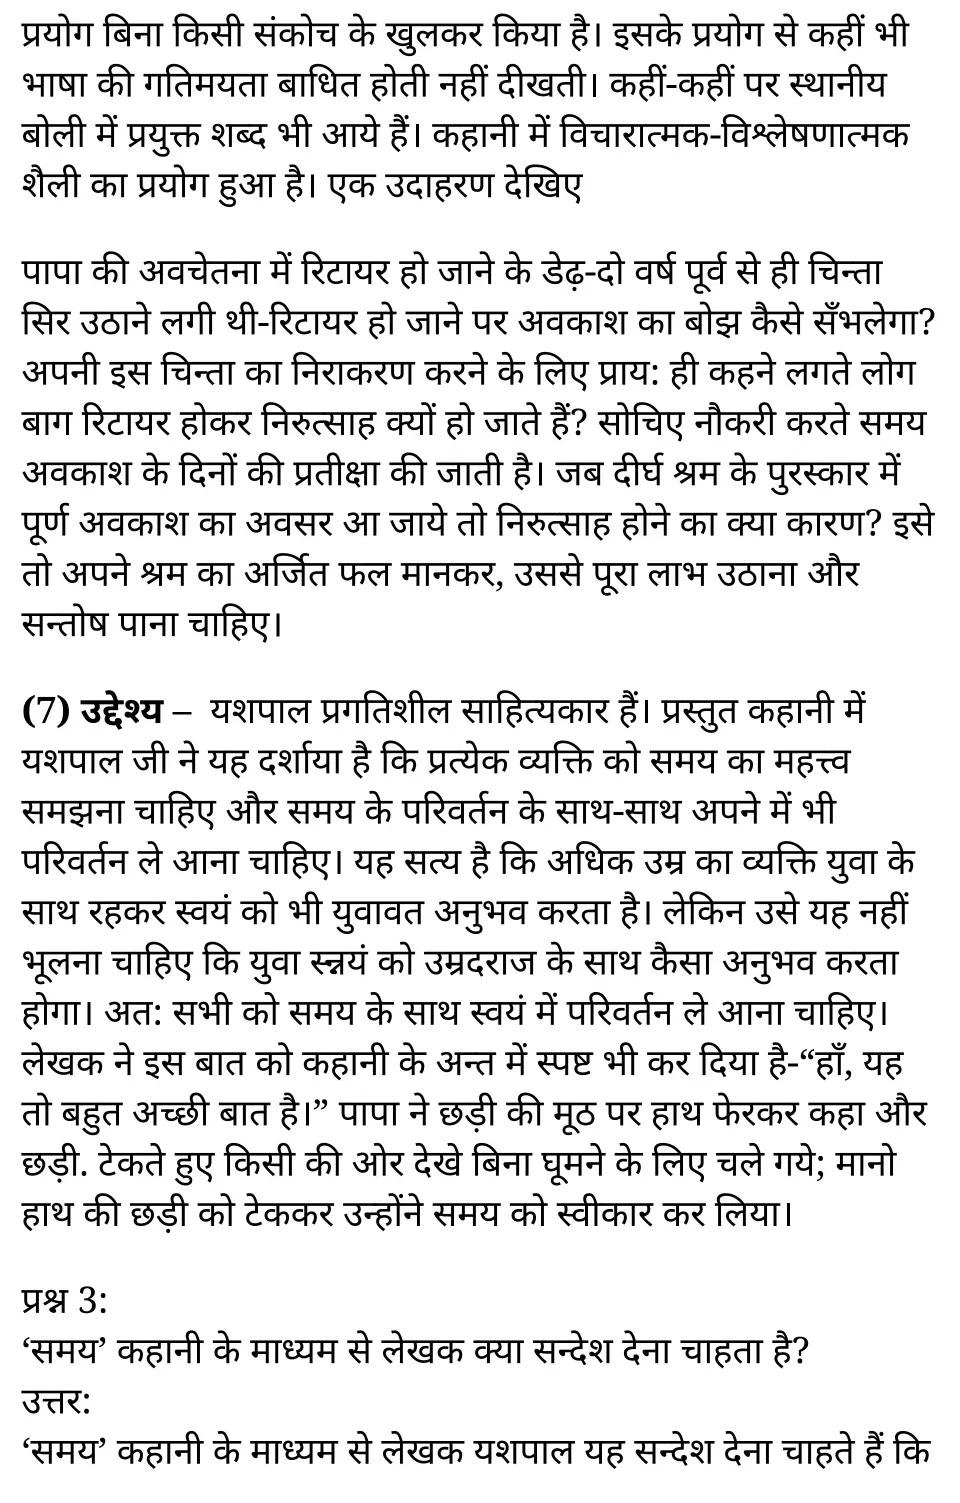 कक्षा 11 साहित्यिक हिंदी कथा-भारती अध्याय 4  के नोट्स साहित्यिक हिंदी में एनसीईआरटी समाधान,   class 11 sahityik hindi katha bharathi chapter 4,  class 11 sahityik hindi katha bharathi chapter 4 ncert solutions in sahityik hindi,  class 11 sahityik hindi katha bharathi chapter 4 notes in sahityik hindi,  class 11 sahityik hindi katha bharathi chapter 4 question answer,  class 11 sahityik hindi katha bharathi chapter 4 notes,  11   class katha bharathi chapter 4 katha bharathi chapter 4 in sahityik hindi,  class 11 sahityik hindi katha bharathi chapter 4 in sahityik hindi,  class 11 sahityik hindi katha bharathi chapter 4 important questions in sahityik hindi,  class 11 sahityik hindi  chapter 4 notes in sahityik hindi,  class 11 sahityik hindi katha bharathi chapter 4 test,  class 11 sahityik hindi  chapter 1katha bharathi chapter 4 pdf,  class 11 sahityik hindi katha bharathi chapter 4 notes pdf,  class 11 sahityik hindi katha bharathi chapter 4 exercise solutions,  class 11 sahityik hindi katha bharathi chapter 4, class 11 sahityik hindi katha bharathi chapter 4 notes study rankers,  class 11 sahityik hindi katha bharathi chapter 4 notes,  class 11 sahityik hindi  chapter 4 notes,   katha bharathi chapter 4  class 11  notes pdf,  katha bharathi chapter 4 class 11  notes  ncert,   katha bharathi chapter 4 class 11 pdf,    katha bharathi chapter 4  book,     katha bharathi chapter 4 quiz class 11  ,       11  th katha bharathi chapter 4    book up board,       up board 11  th katha bharathi chapter 4 notes,  कक्षा 11 साहित्यिक हिंदी कथा-भारती अध्याय 4 , कक्षा 11 साहित्यिक हिंदी का कथा-भारती, कक्षा 11 साहित्यिक हिंदी के कथा-भारती अध्याय 4  के नोट्स साहित्यिक हिंदी में, कक्षा 11 का साहित्यिक हिंदीकथा-भारती अध्याय 4 का प्रश्न उत्तर, कक्षा 11 साहित्यिक हिंदी कथा-भारती अध्याय 4 के नोट्स, 11 कक्षा साहित्यिक हिंदी कथा-भारती अध्याय 4   साहित्यिक हिंदी में,कक्षा 11 साहित्यिक हिंदी कथा-भारती अध्याय 4  साहित्यिक हिंदी में, कक्षा 11 साहित्यिक हिंदी कथा-भारती अध्याय 4  महत्वपूर्ण